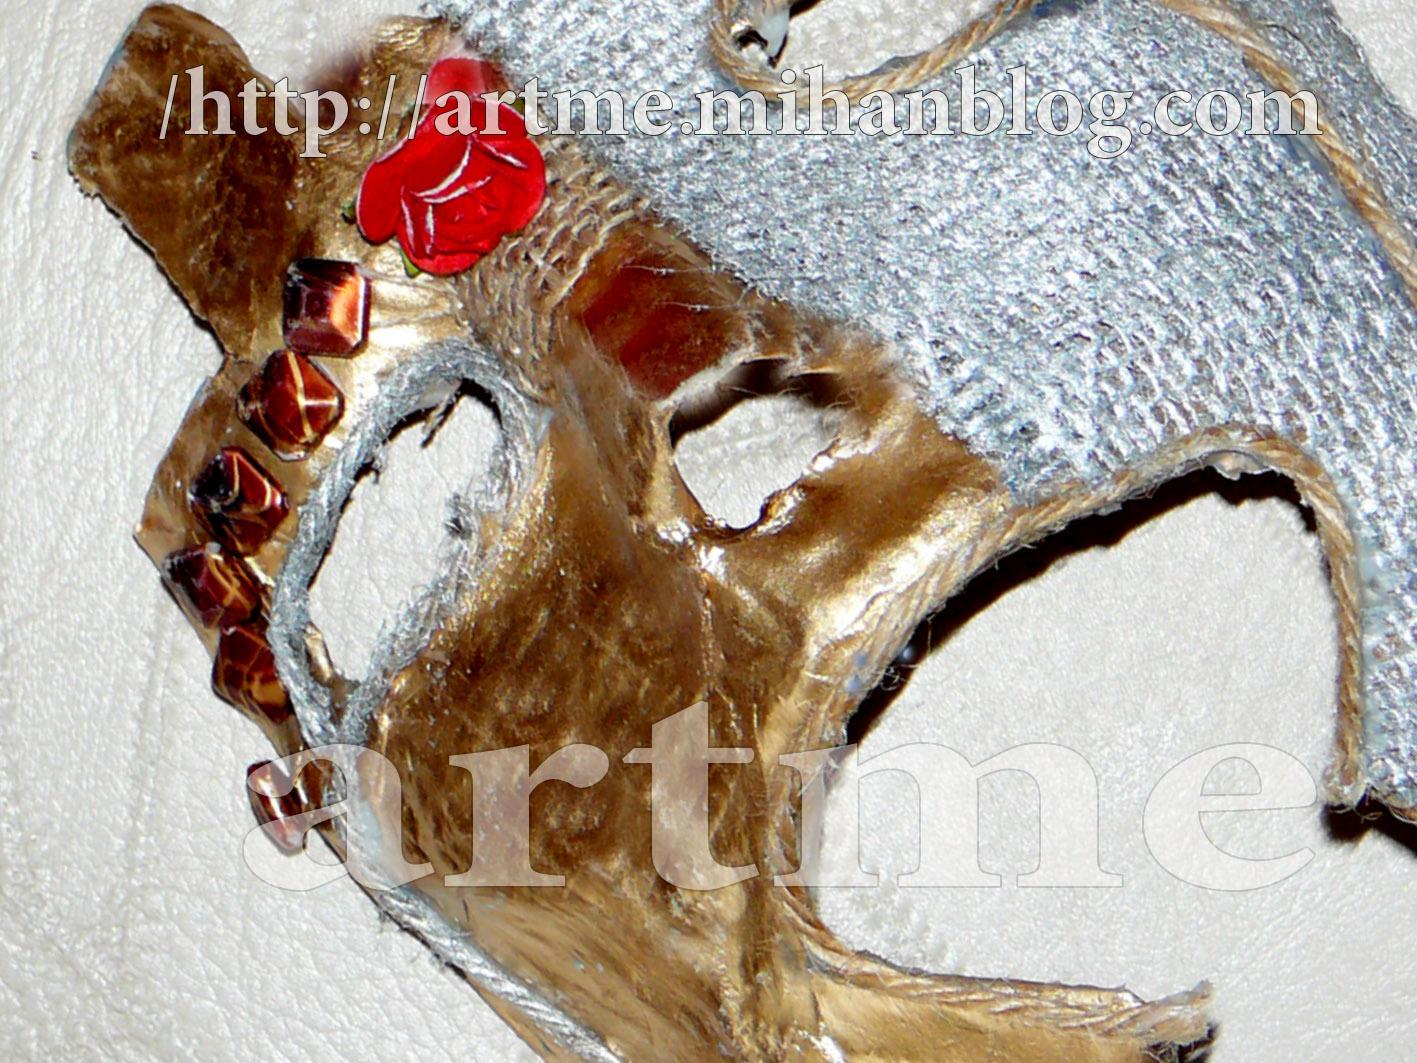 http://www.uplooder.net/img/image/33/ea187f182f7397ac8bceb7b59120280e/g2.jpg